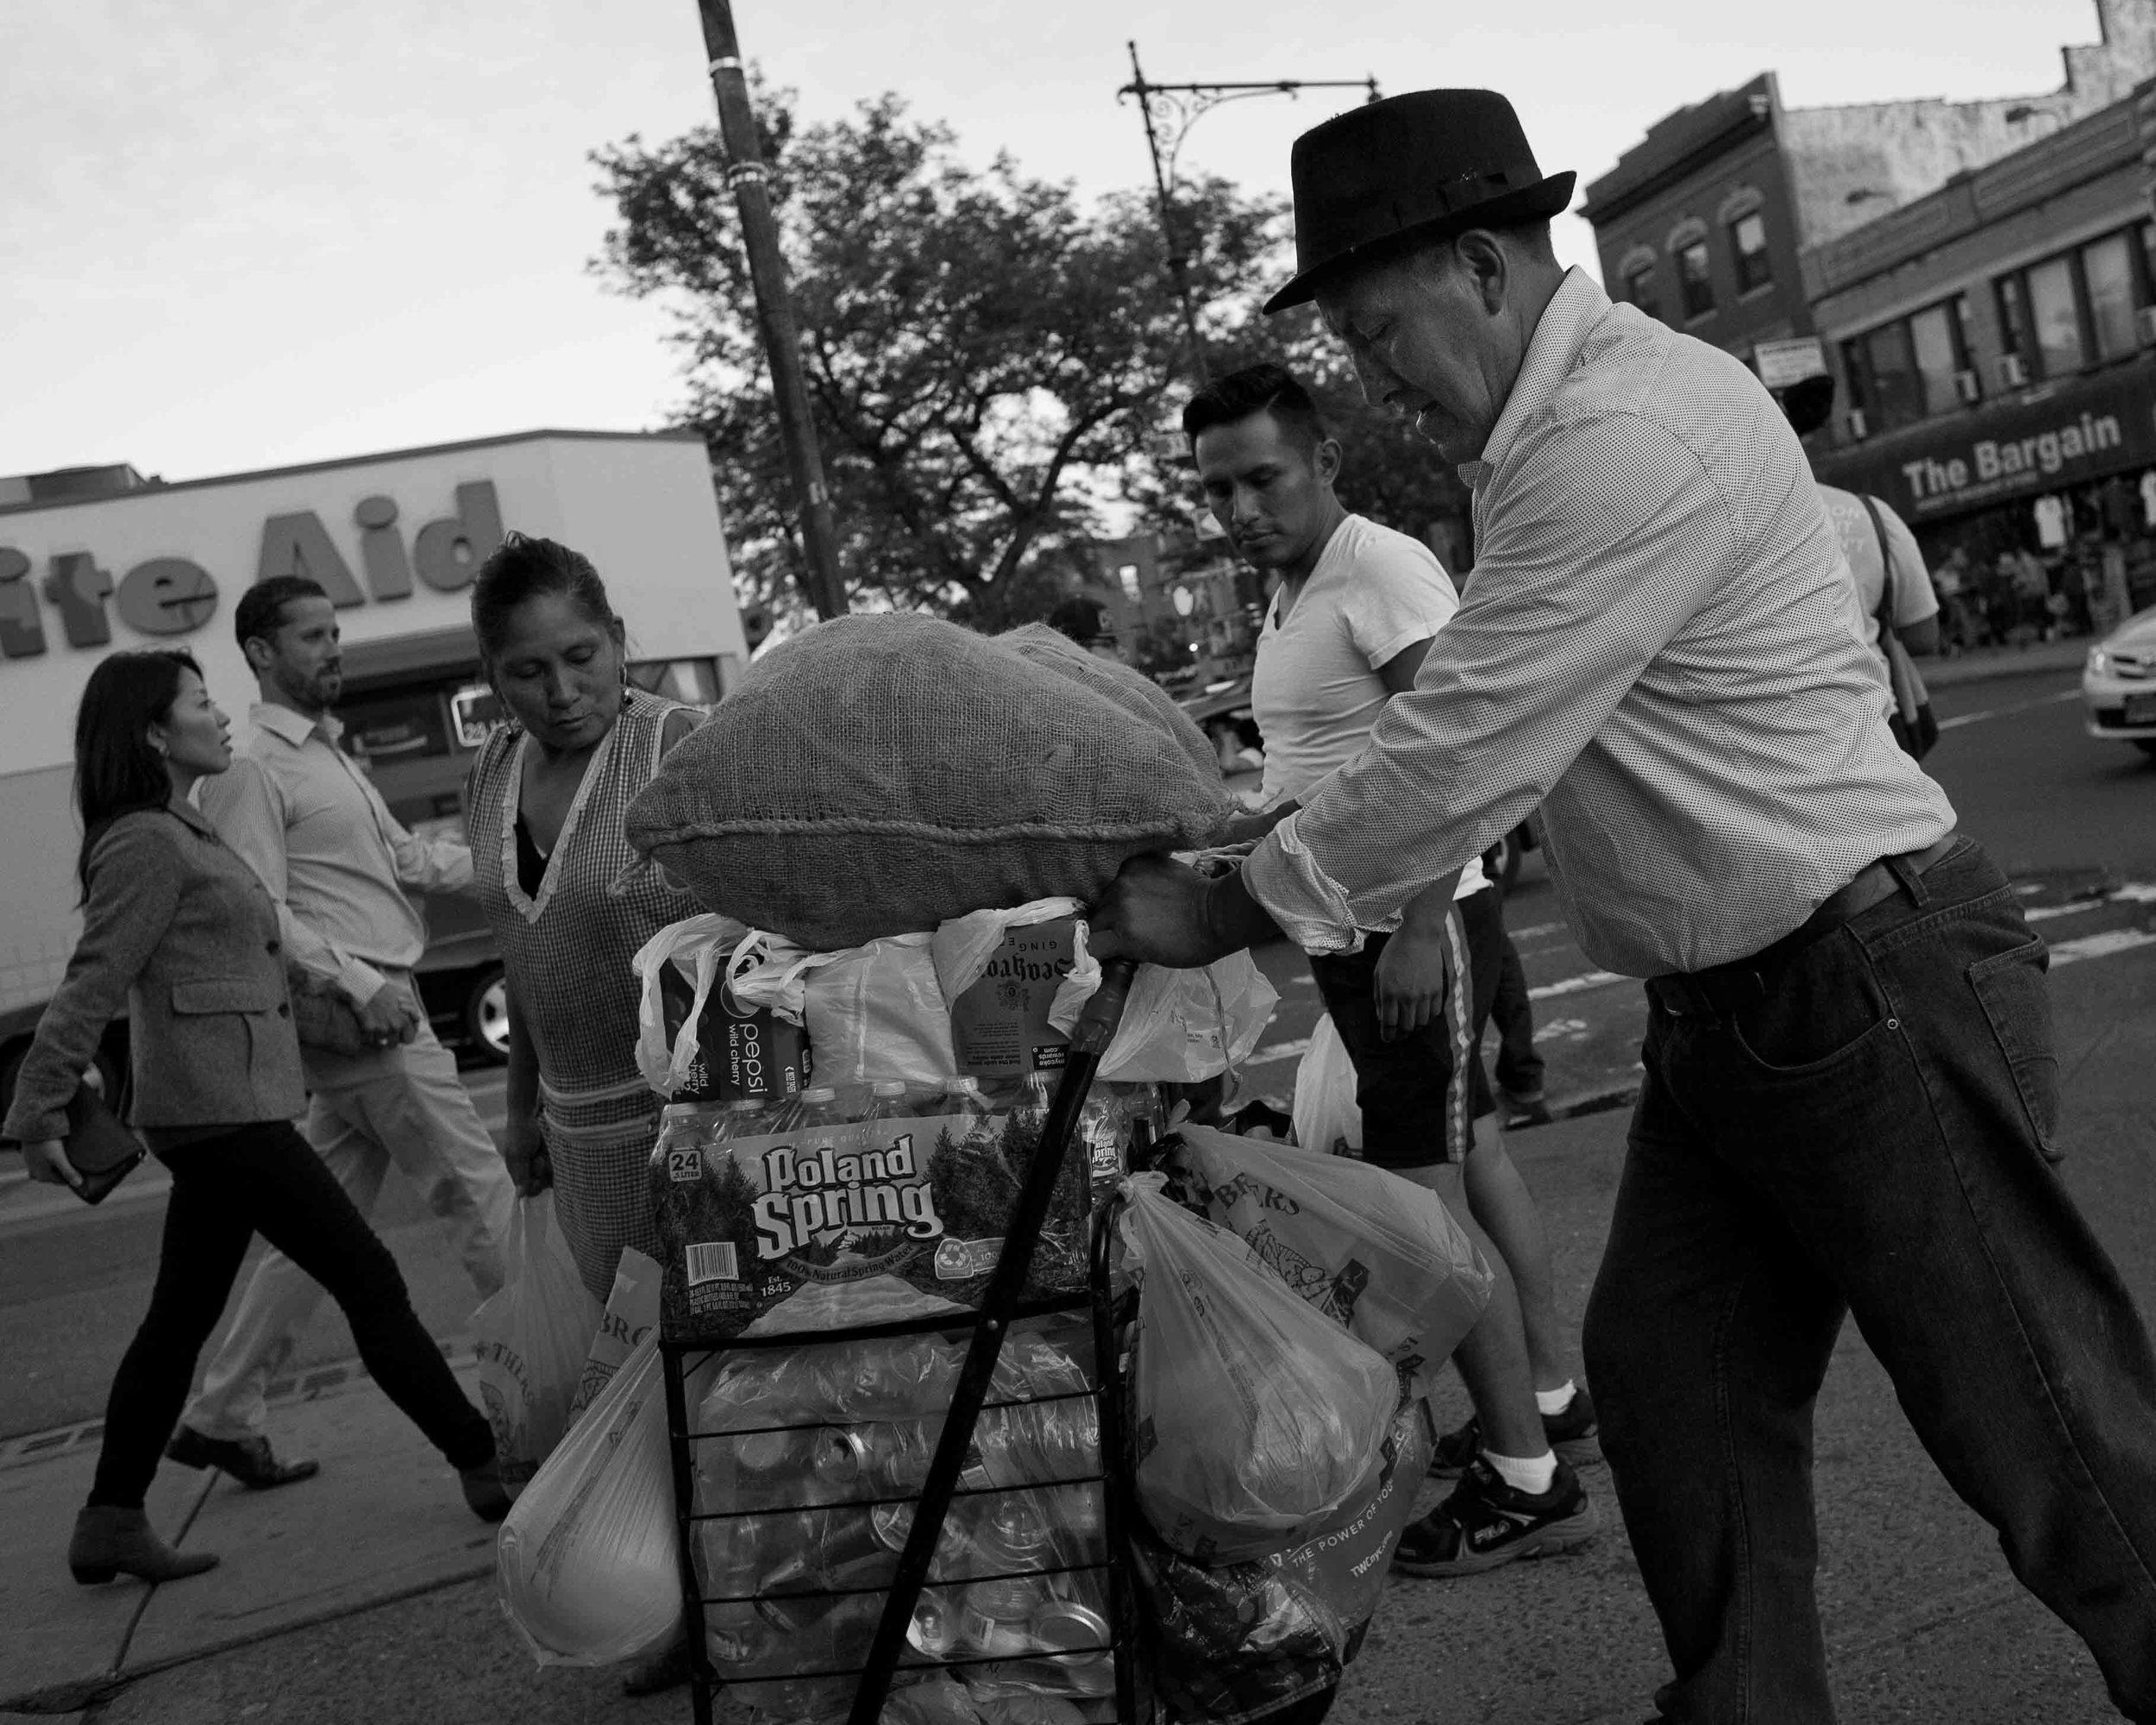 Anthony M. Trujillo Photography-186.jpg